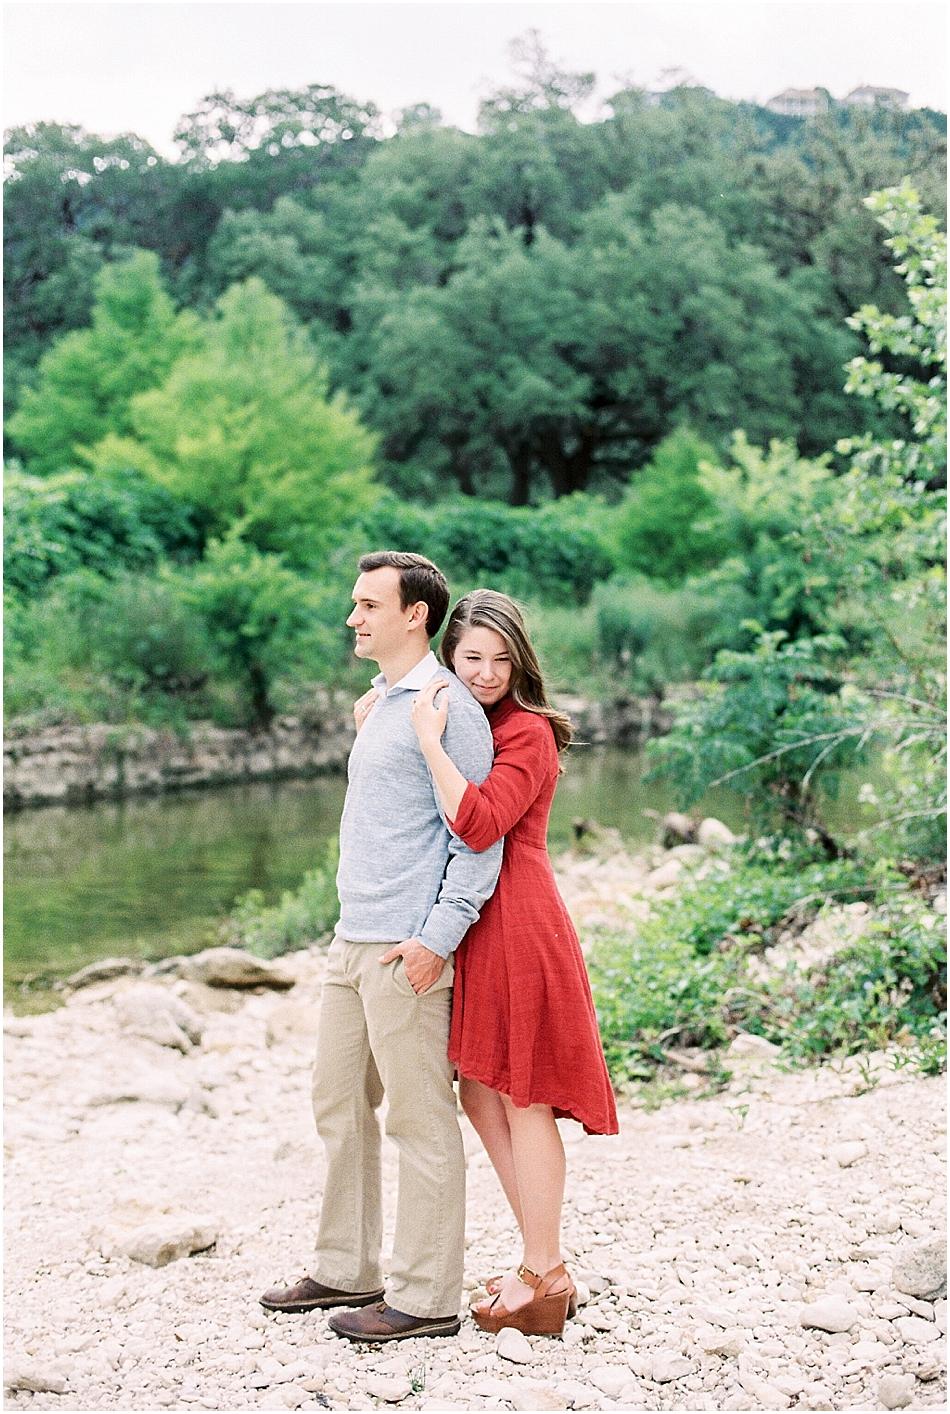 Laura + Nick | Engagement | Fine Art Film | Austin Texas | Emilie Anne Photography-35.jpg